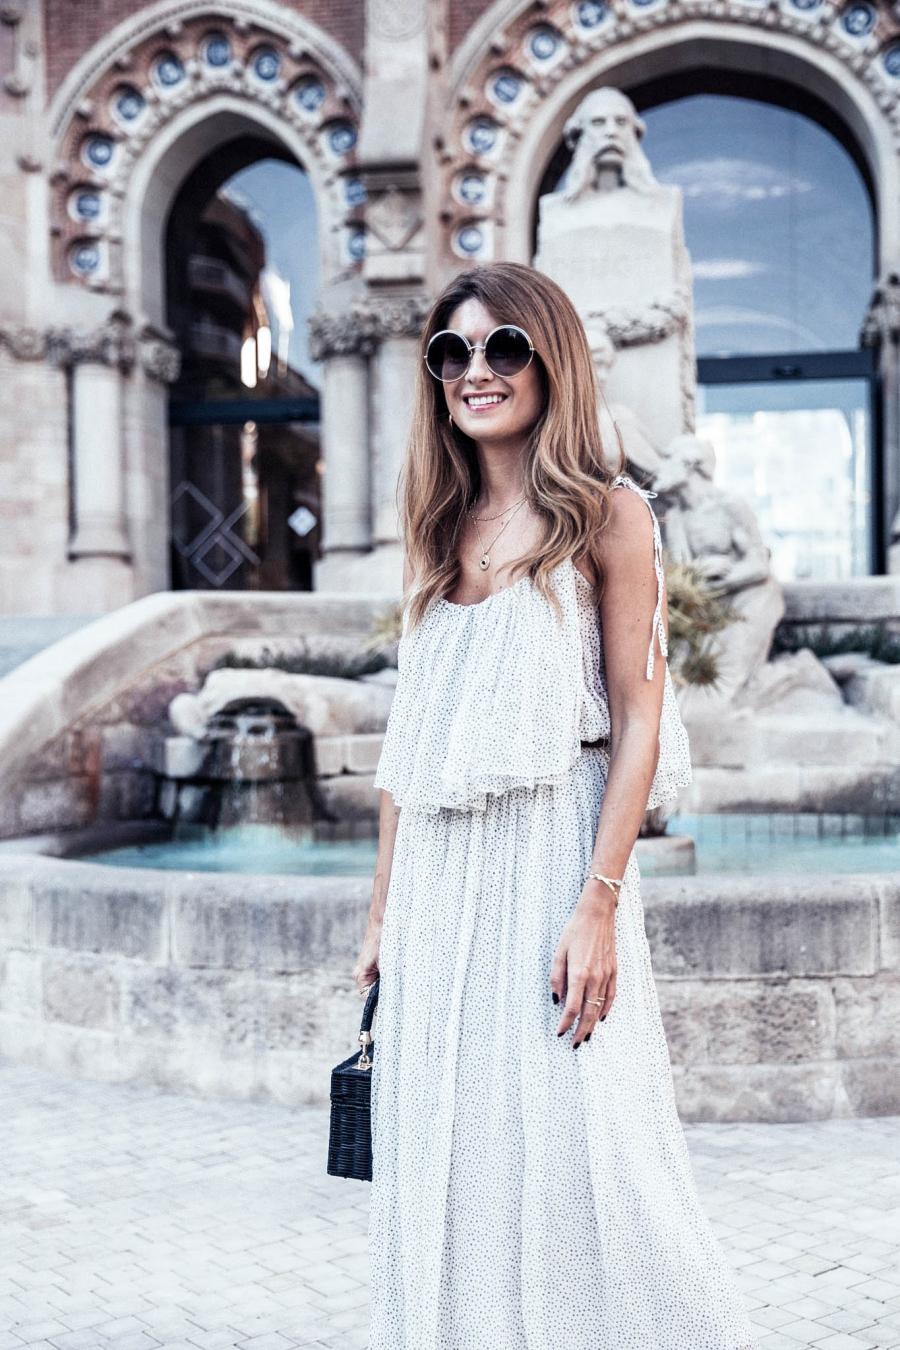 a trendy life fashion fashion blogger tcn tcn fashion show 080bcnfashion vestido vaporoso20180625 080 tcn 028 - VESTIDO MIDI VAPOROSO - 080 BARCELONA FASHION